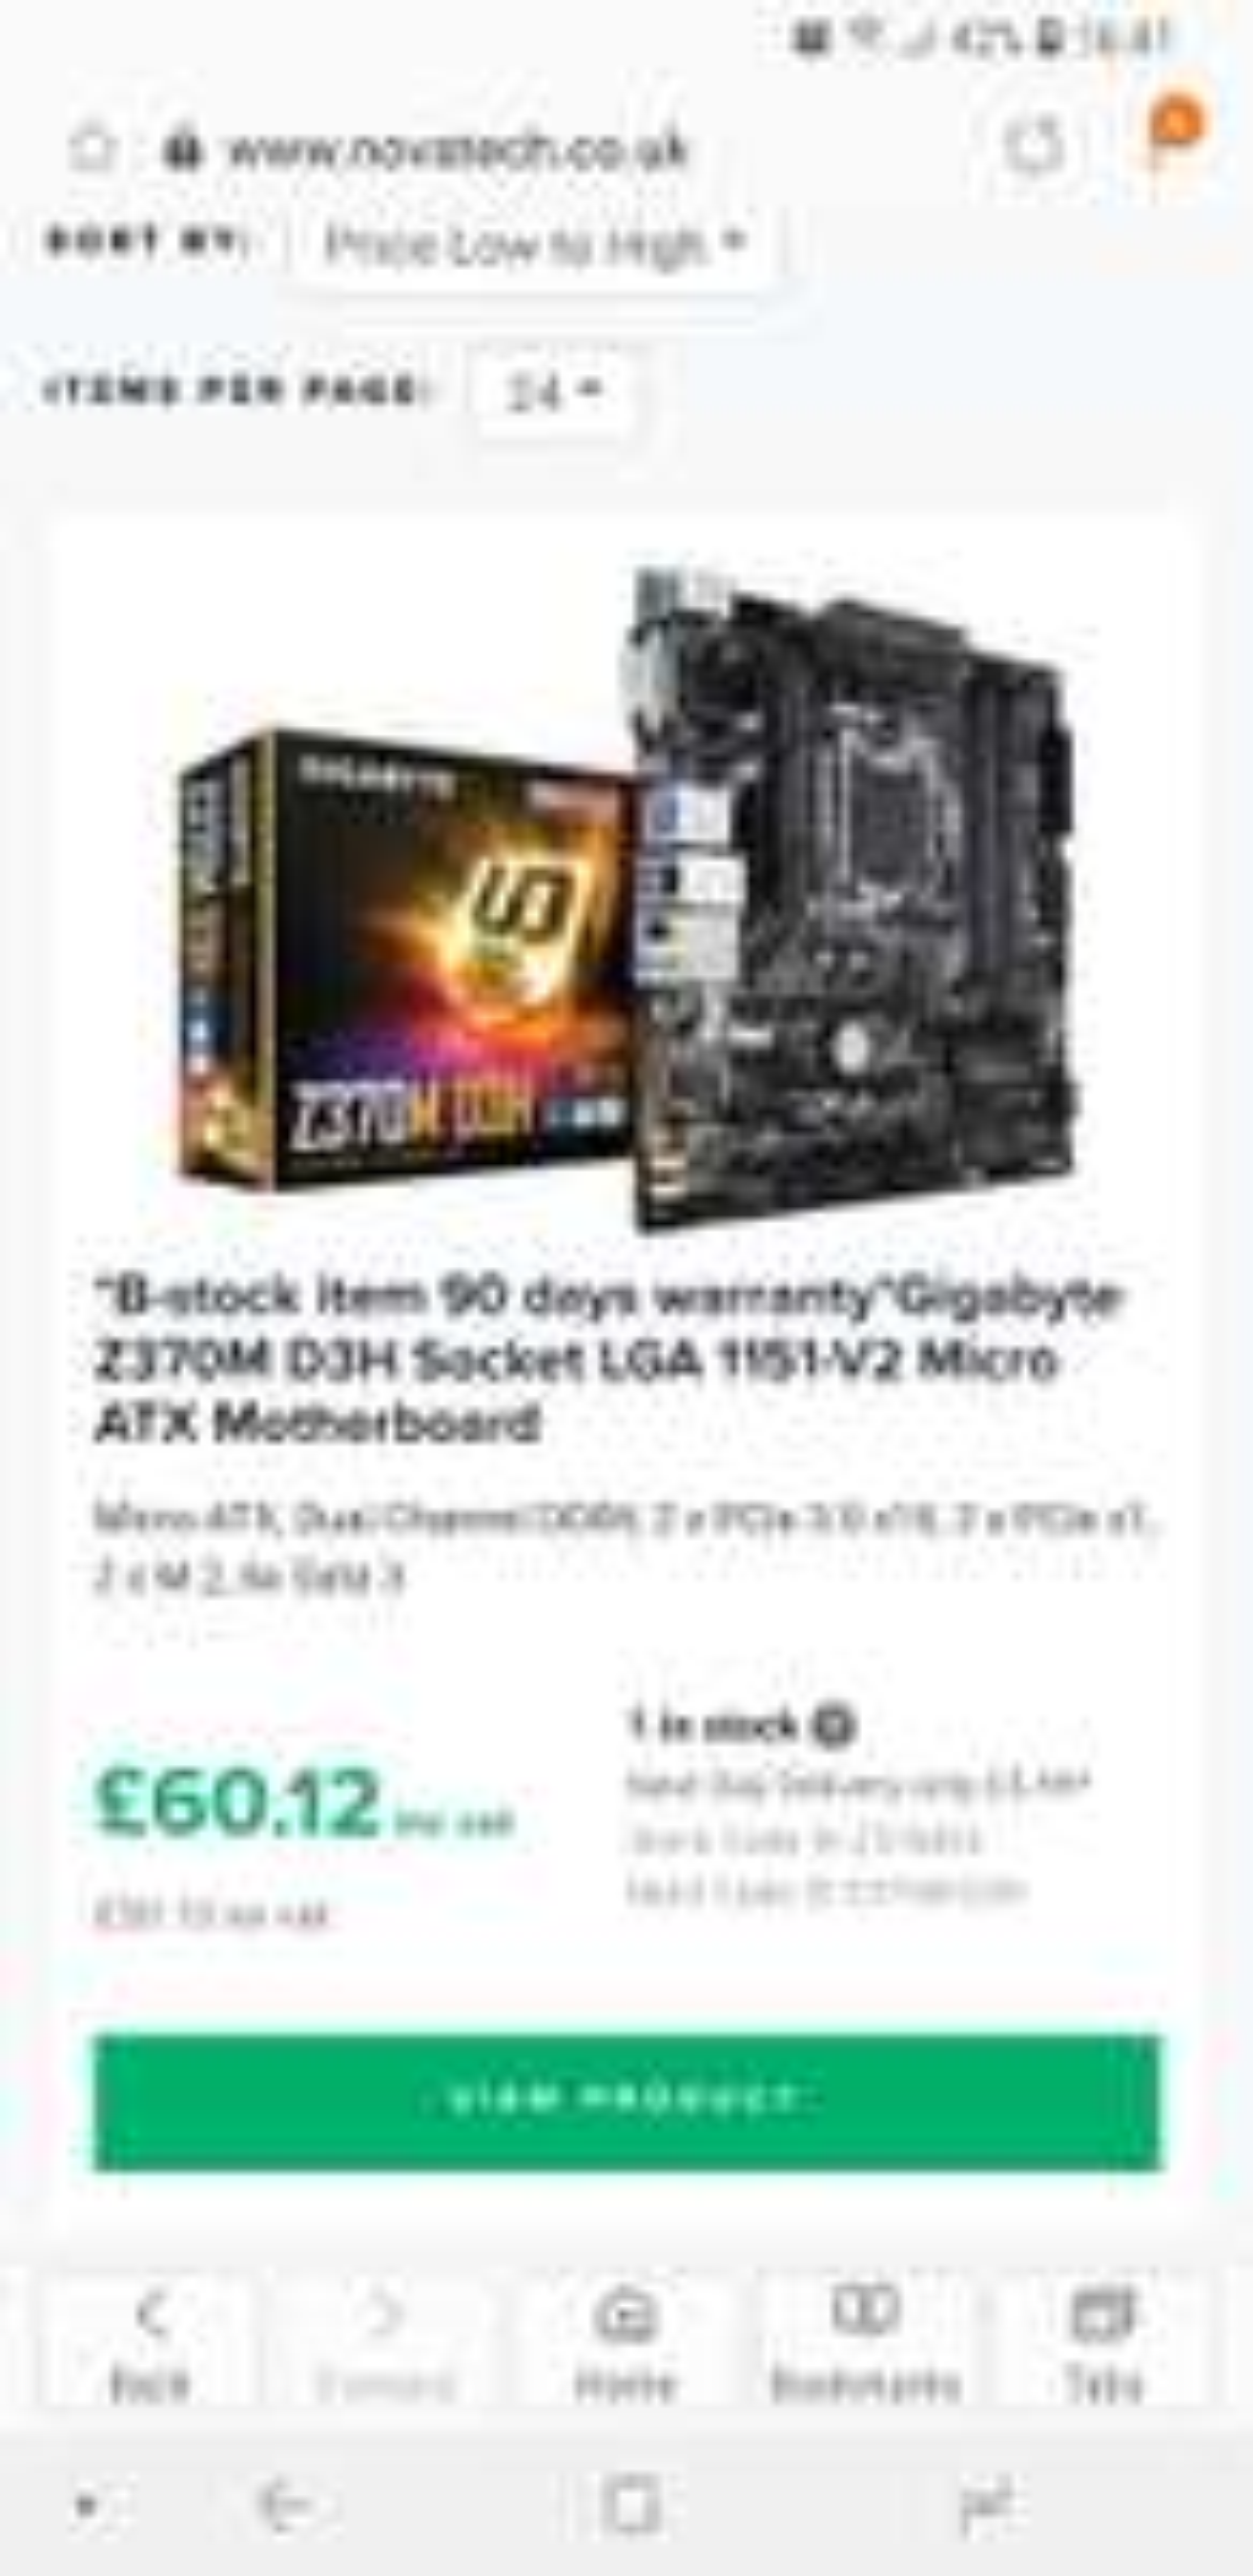 Gigabyte Z370 D3H Micro ATX Socket 1151 Motherboard *Refurbished with 90 day warranty* £60.12 @ Novatech